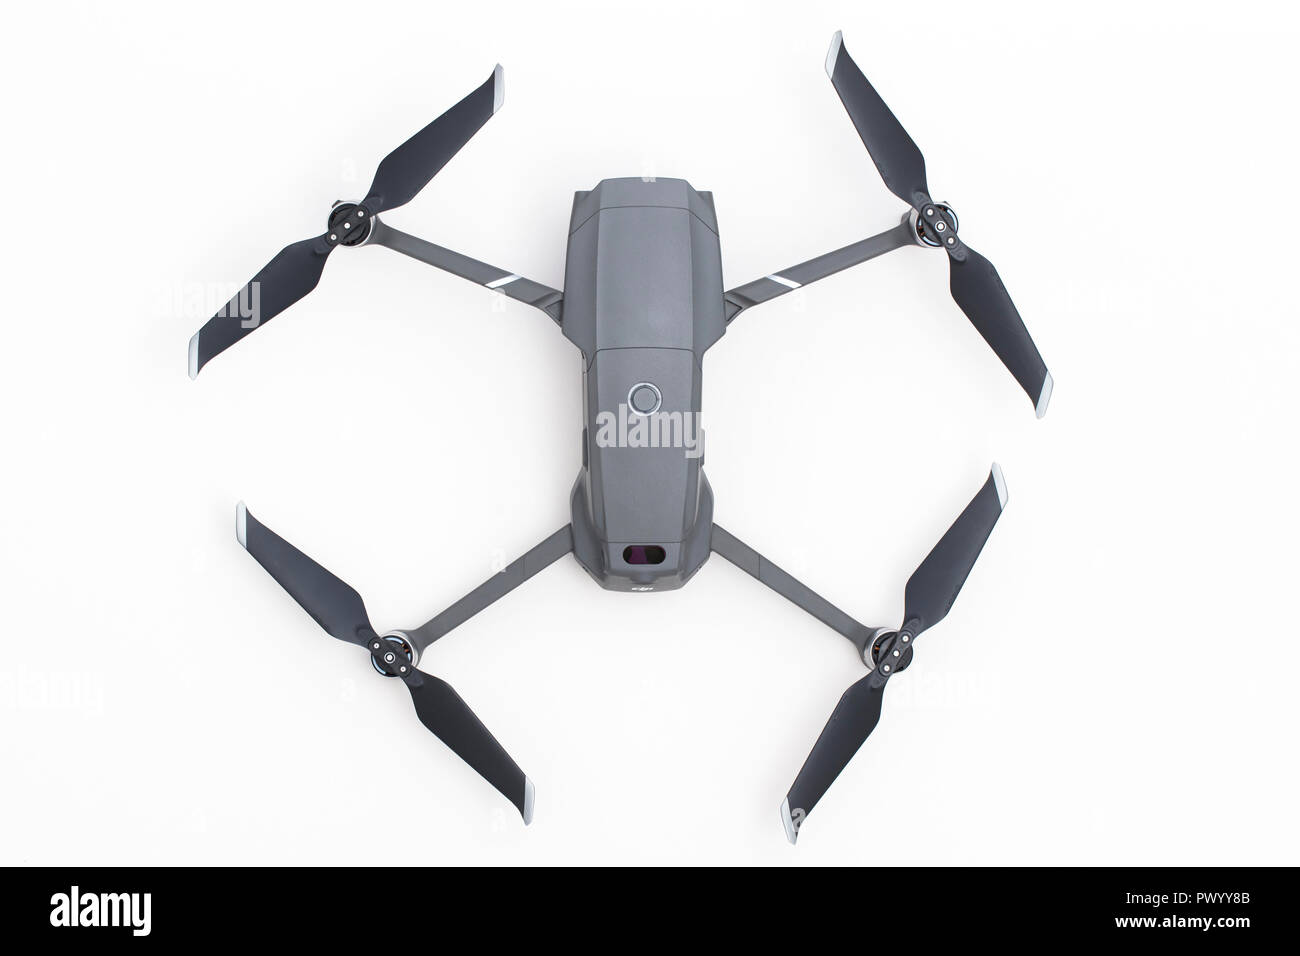 Londres, Reino Unido - 18 de octubre 2018: DJI Mavic Pro 2 antena drone cámara sobre un fondo blanco. Foto de stock